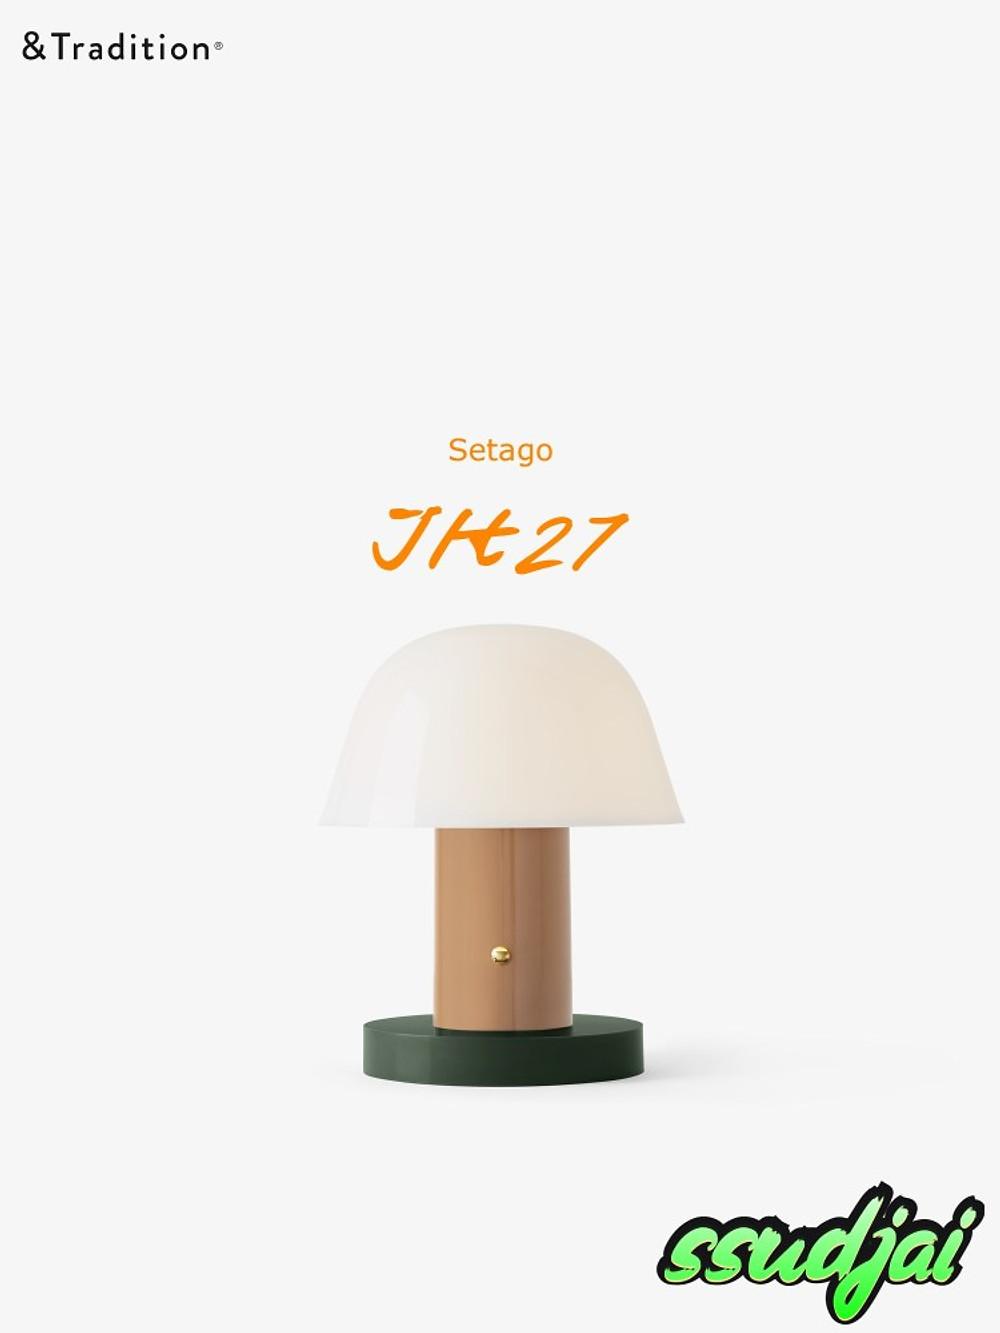 Setago JH27